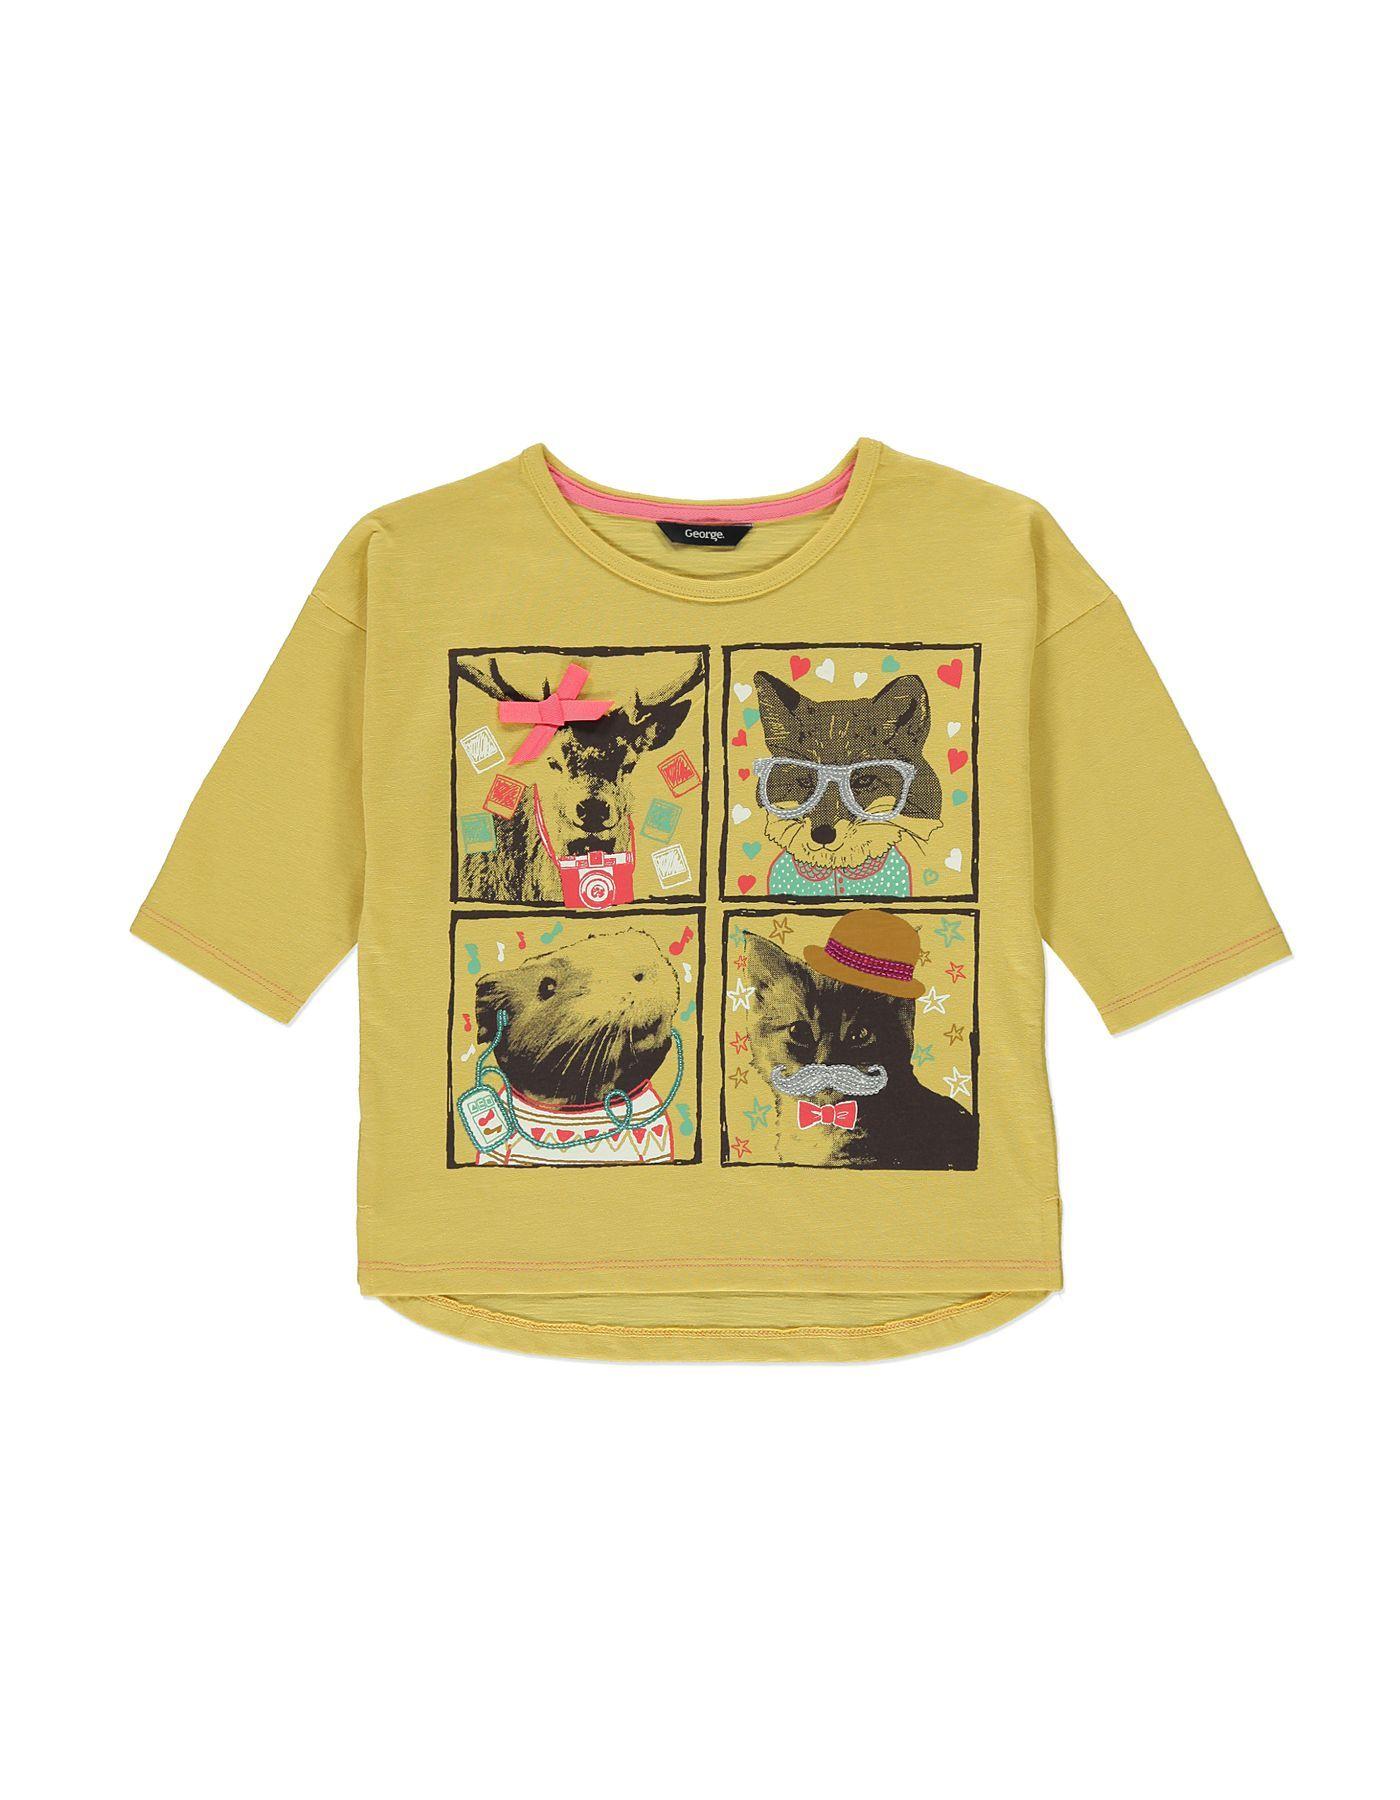 13+ Animal print t shirts ideas